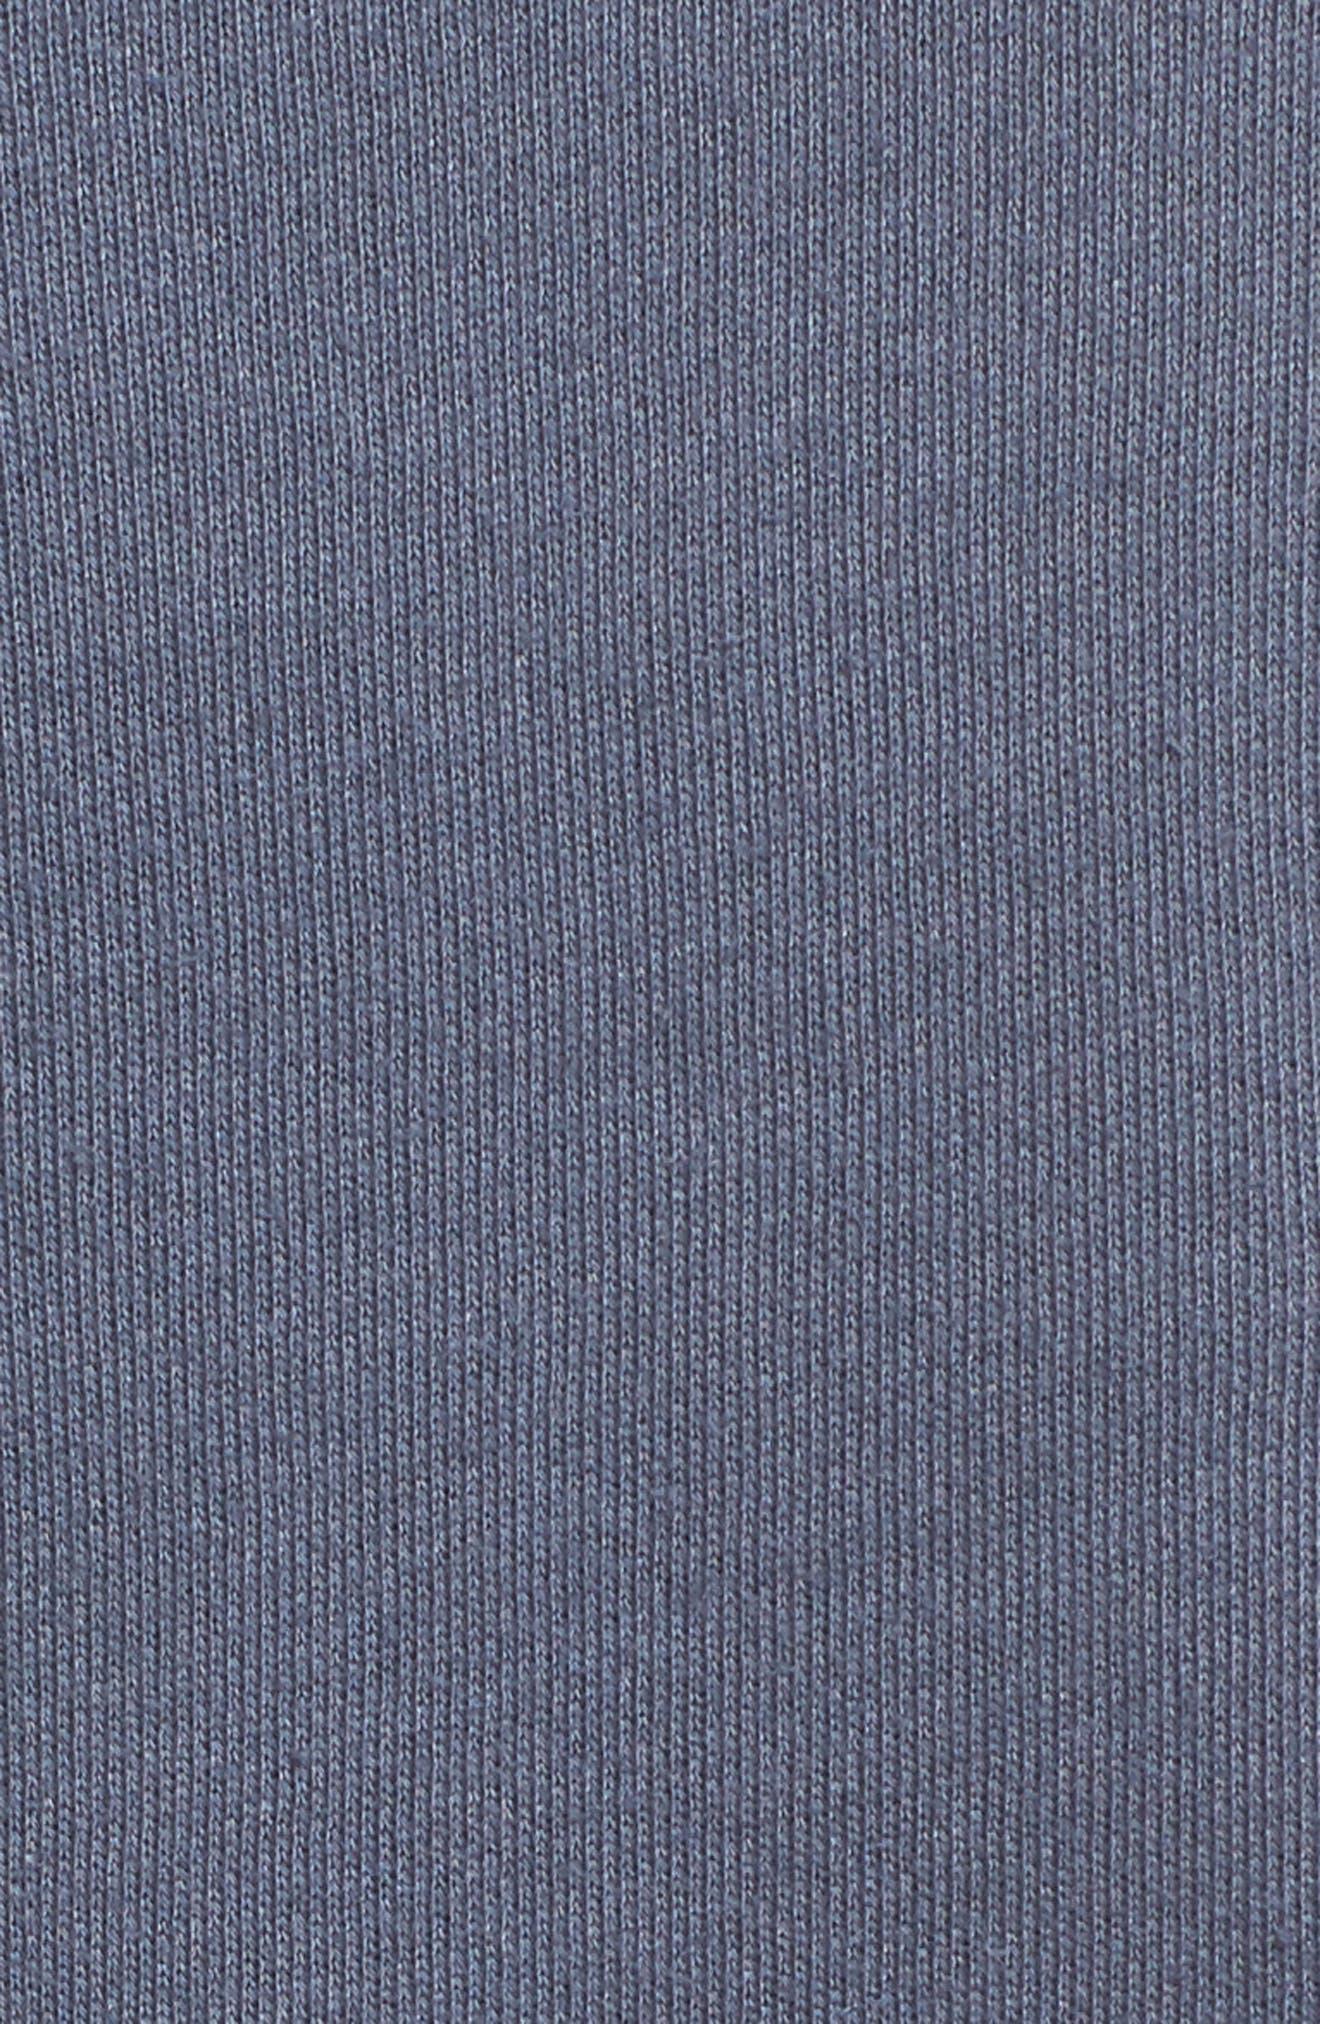 Corset Sweatshirt,                             Alternate thumbnail 5, color,                             Steel